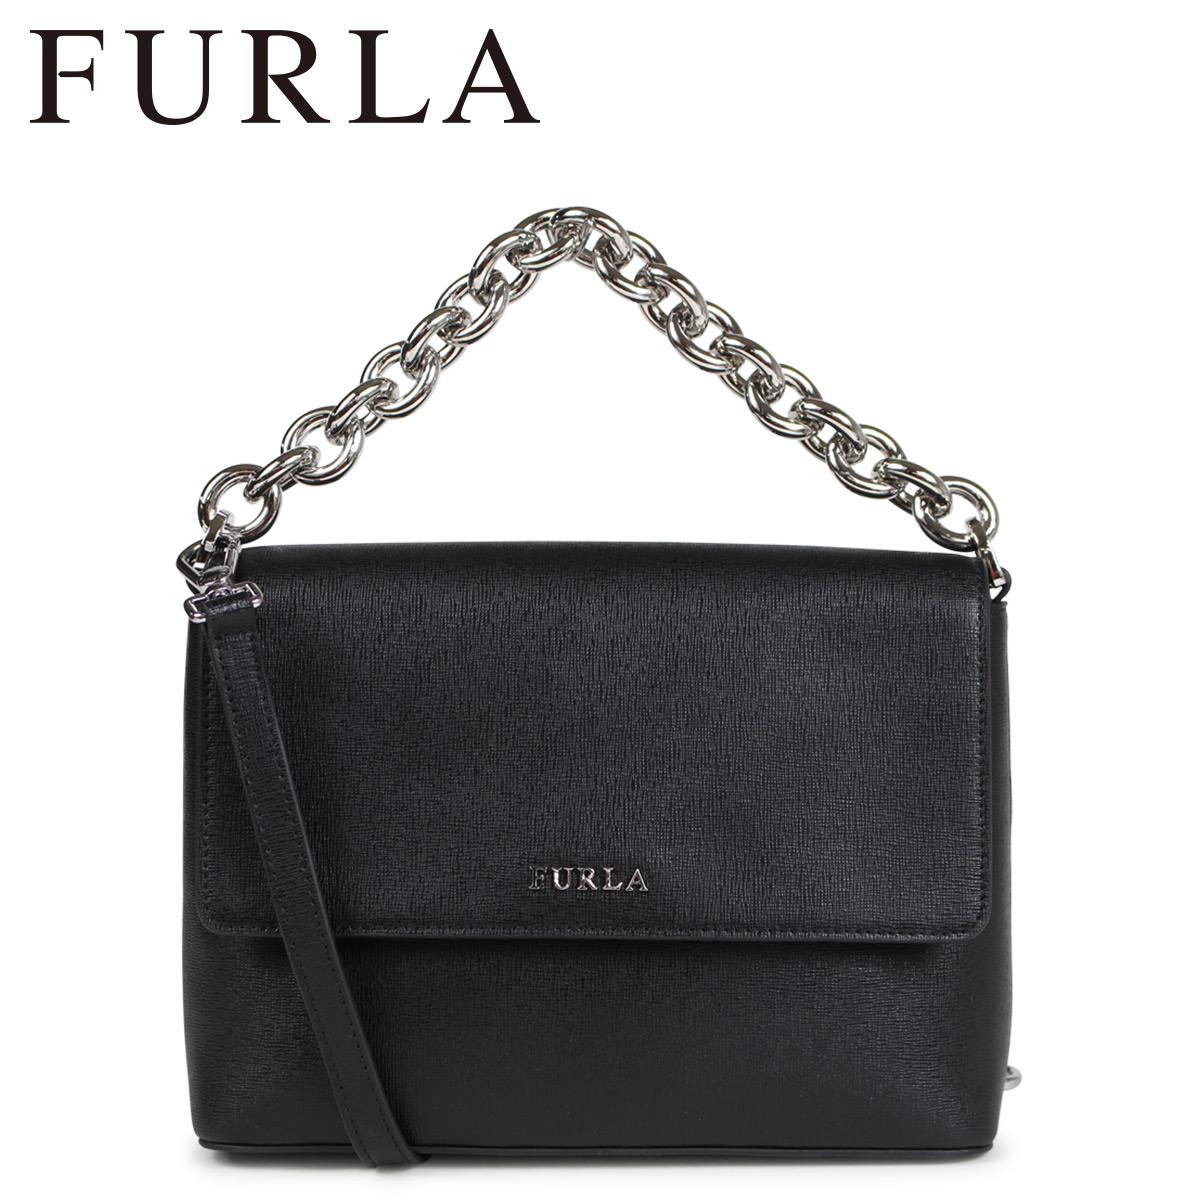 FURLA CHAIN SHOULDER BAG フルラ バッグ ショルダーバッグ レディース ブラック 975495